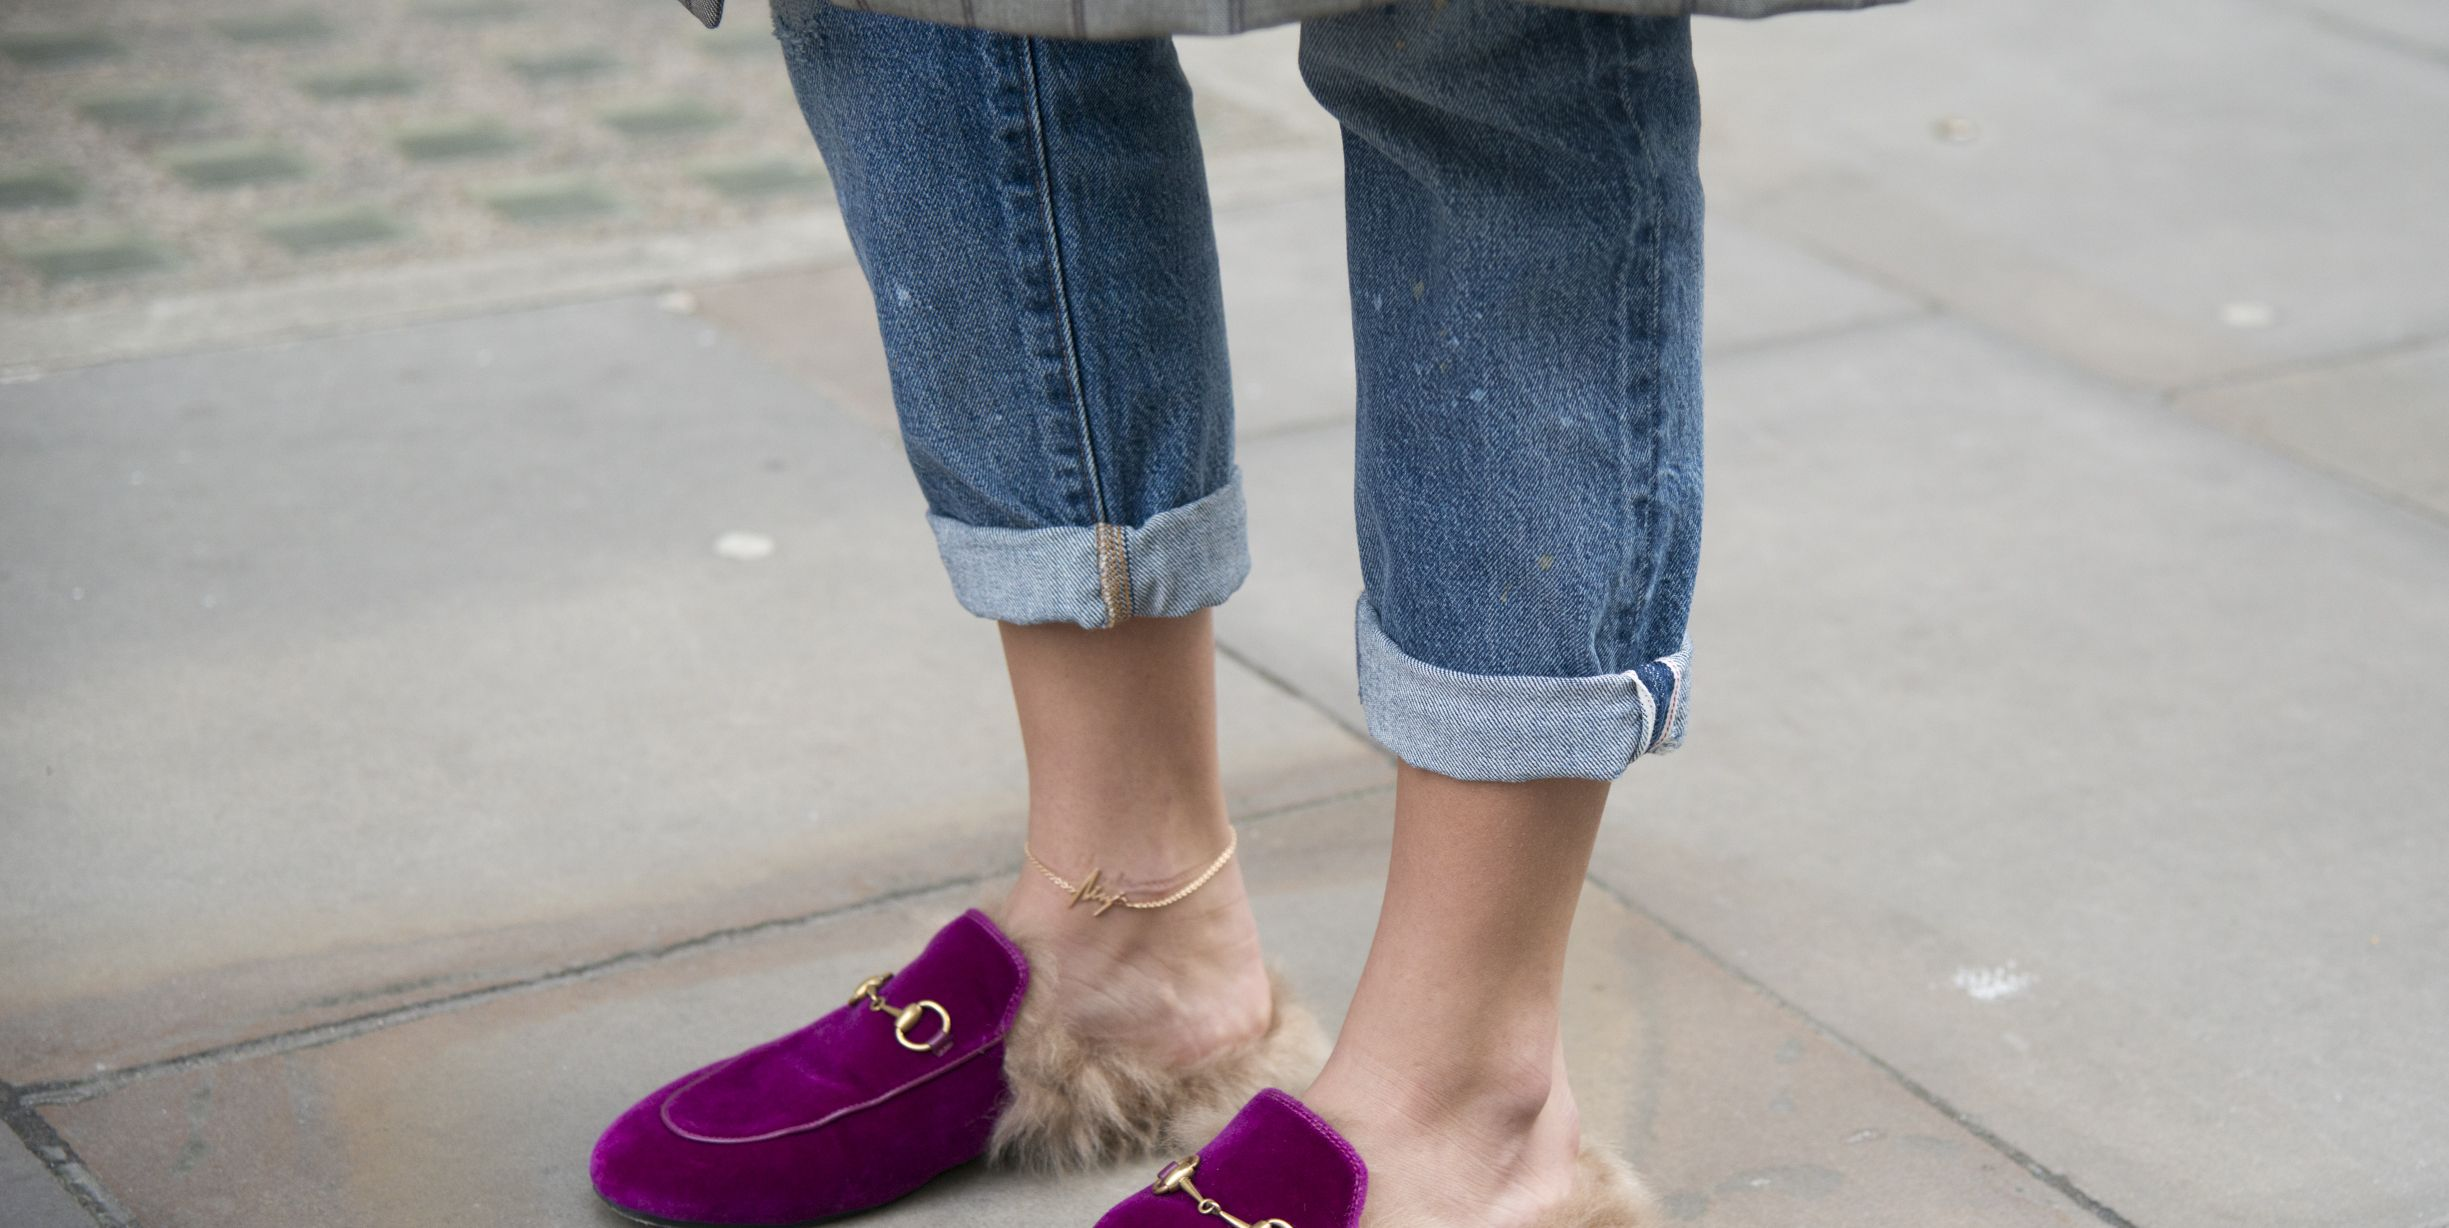 London Fashion Week Warns: No Fur